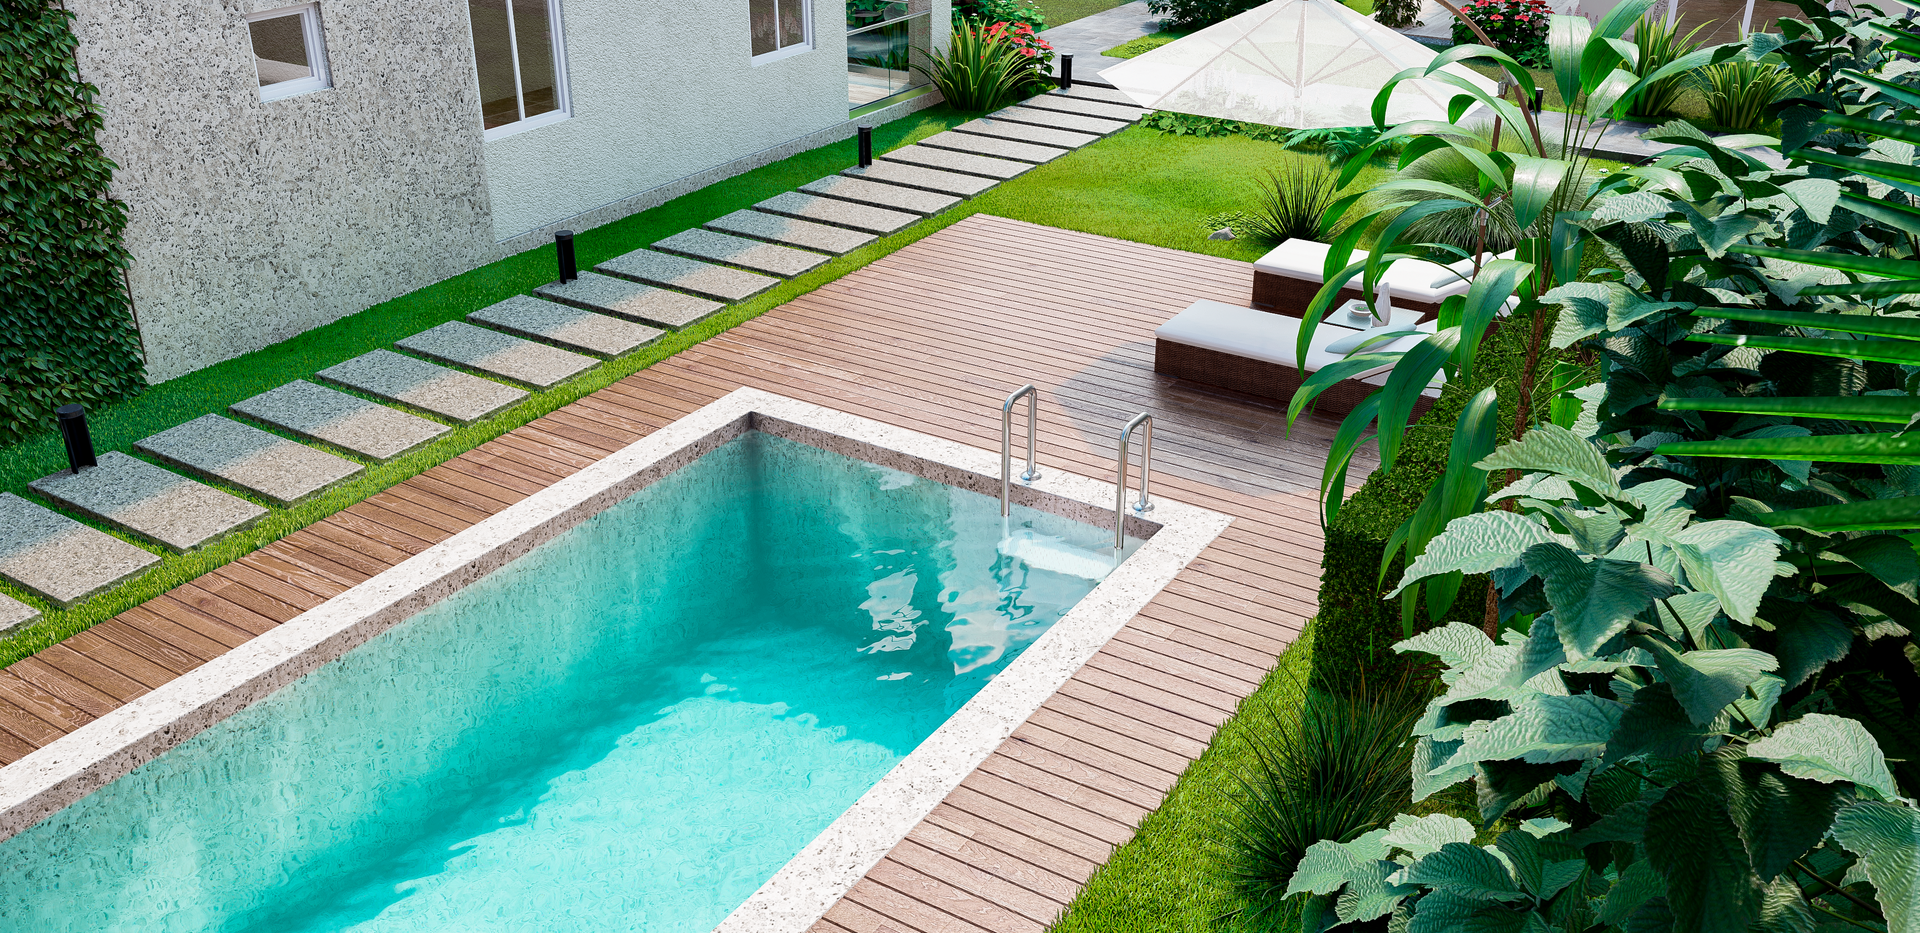 Pool Area - Buildings